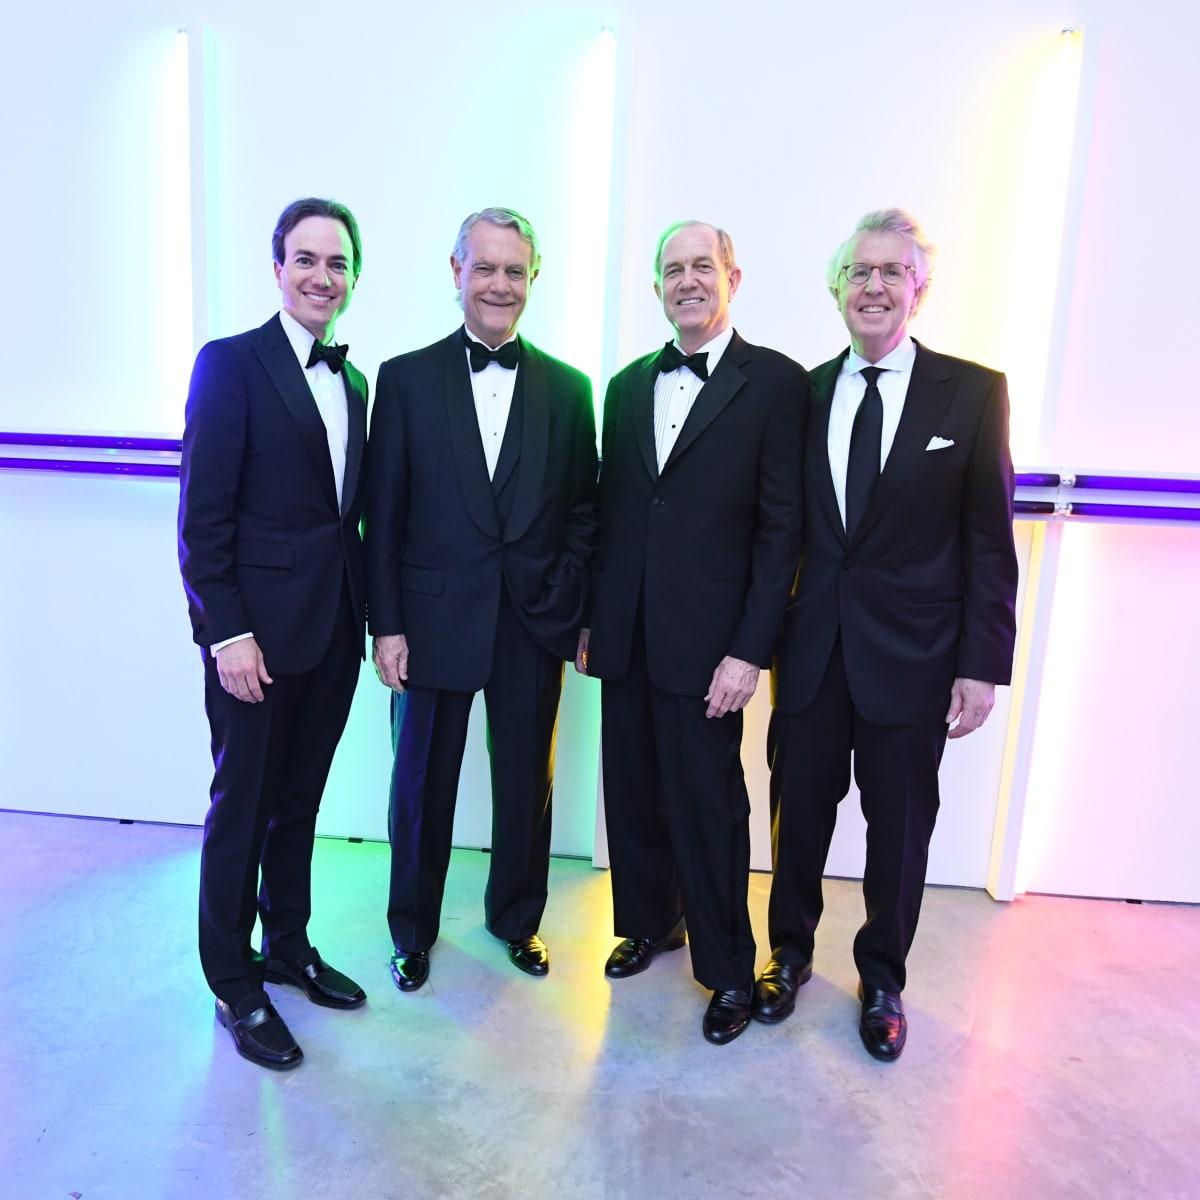 Men of Menil 2016 Co-Chairs Danny David, Bill Stewart, Brad Bucher, and George Kelly